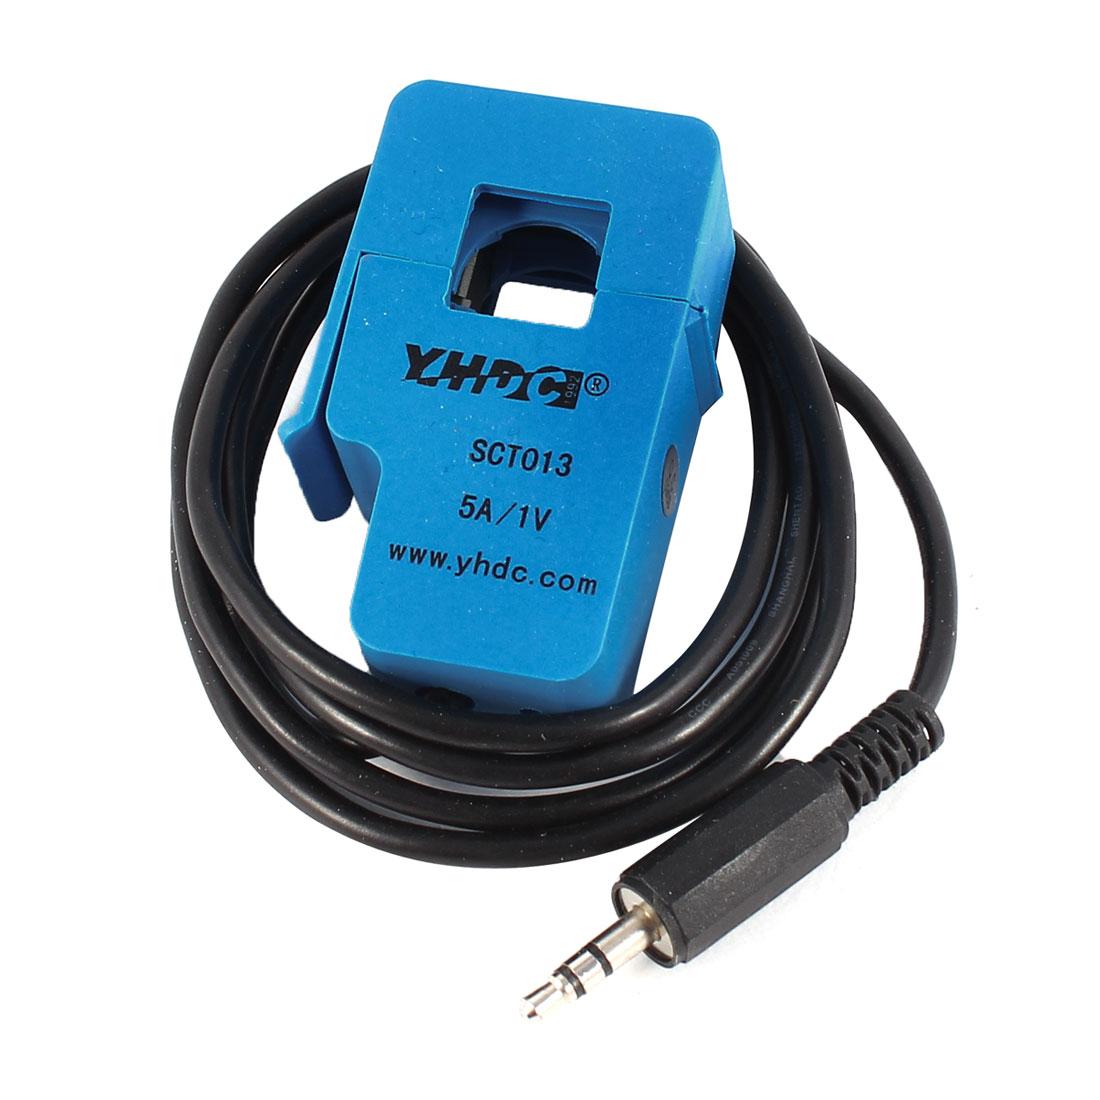 SCT-013-005 1M Long 3.5mm Output Cable Split-core Current Transformer 5A 1V